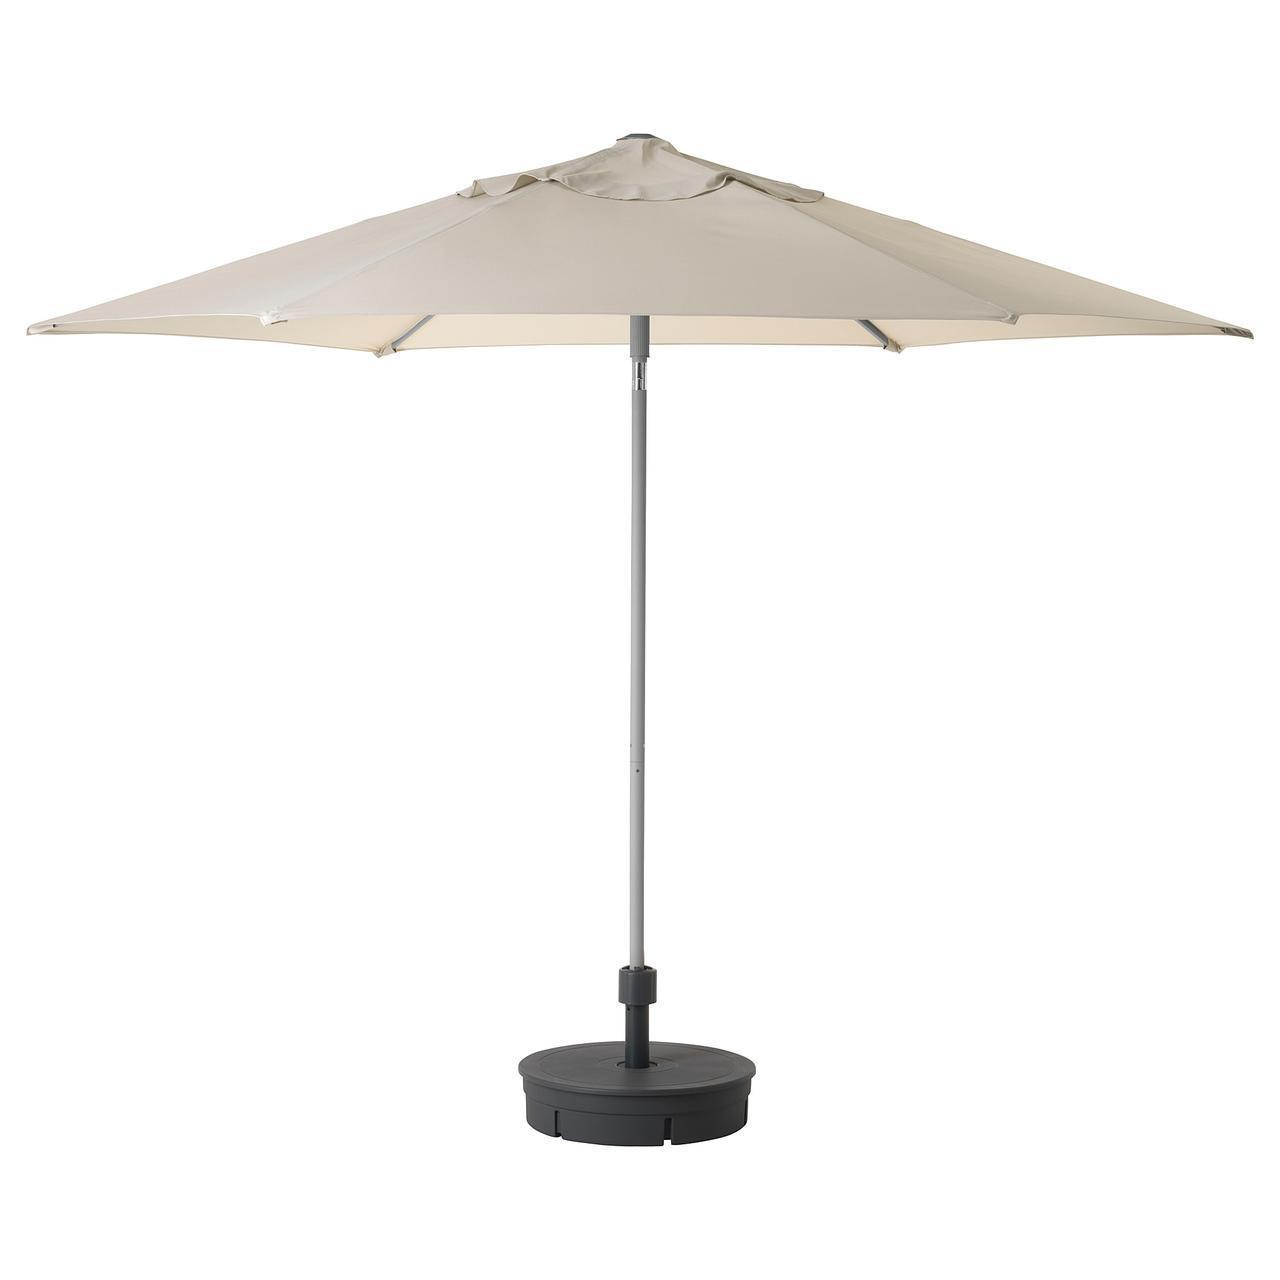 IKEA KUGGO/LINDOJA Зонт с подставкой, бежевый, гритö темно-серый  (292.676.16)